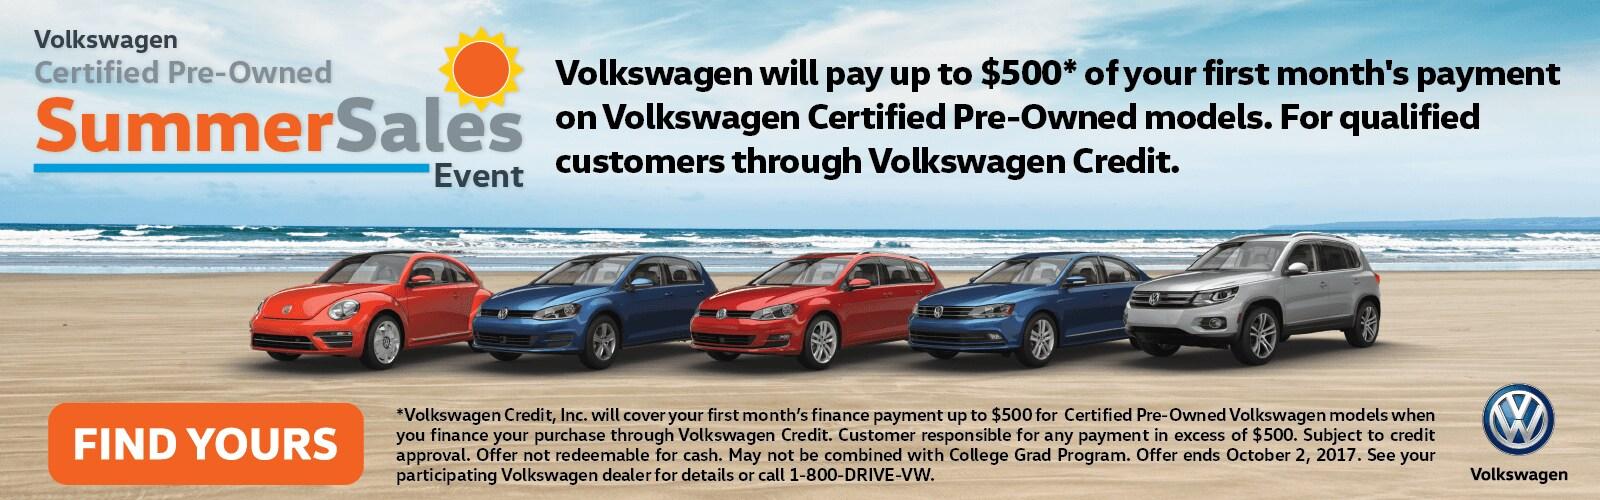 East Coast Vw >> South Carolina Volkswagen Dealership East Coast Volkswagen